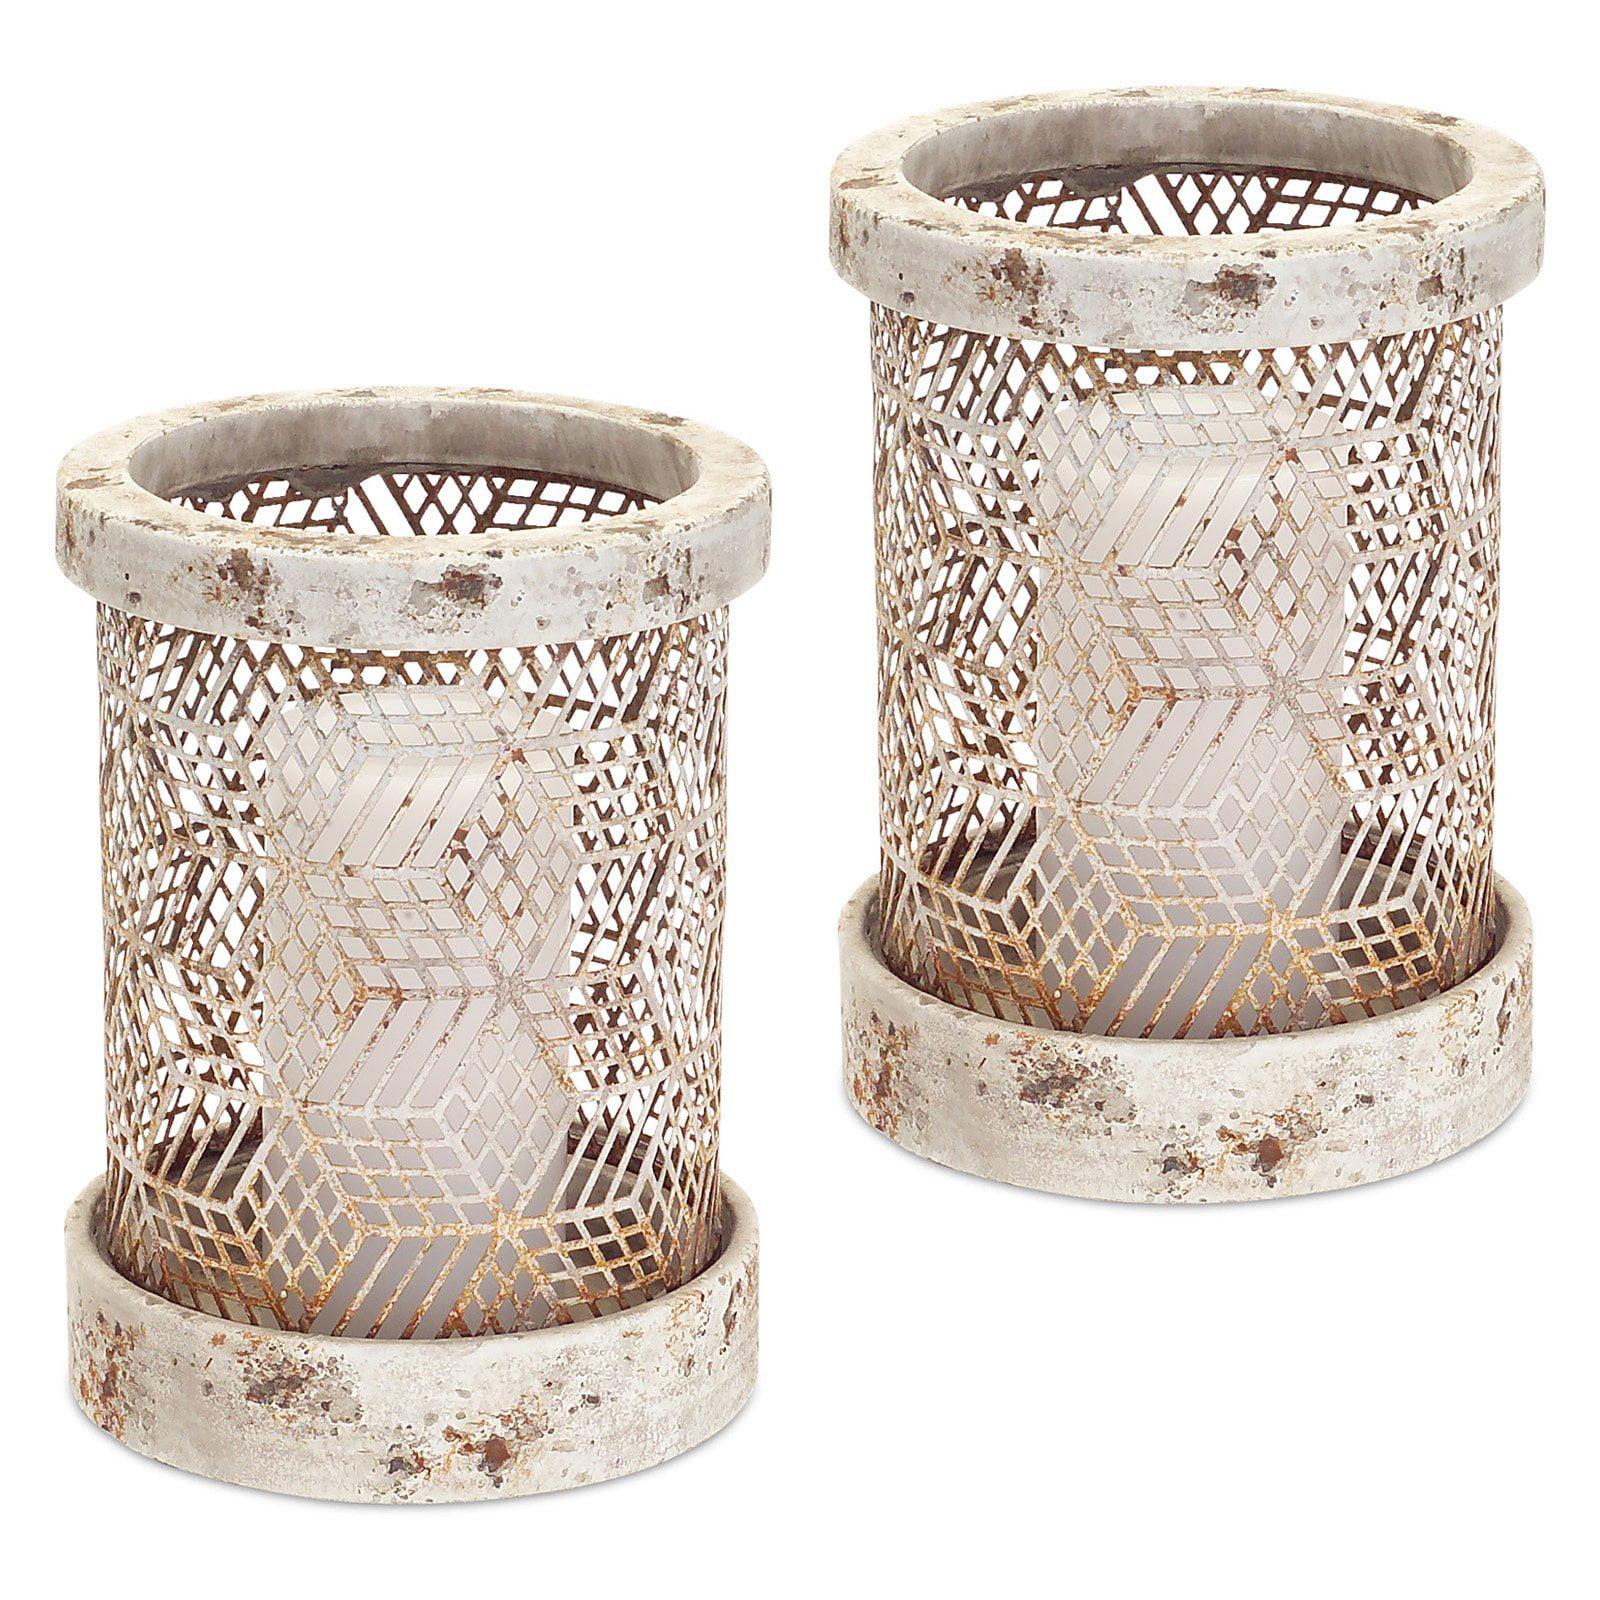 Melrose International Cylindrical Stone Look Candle Holder - Set of 2